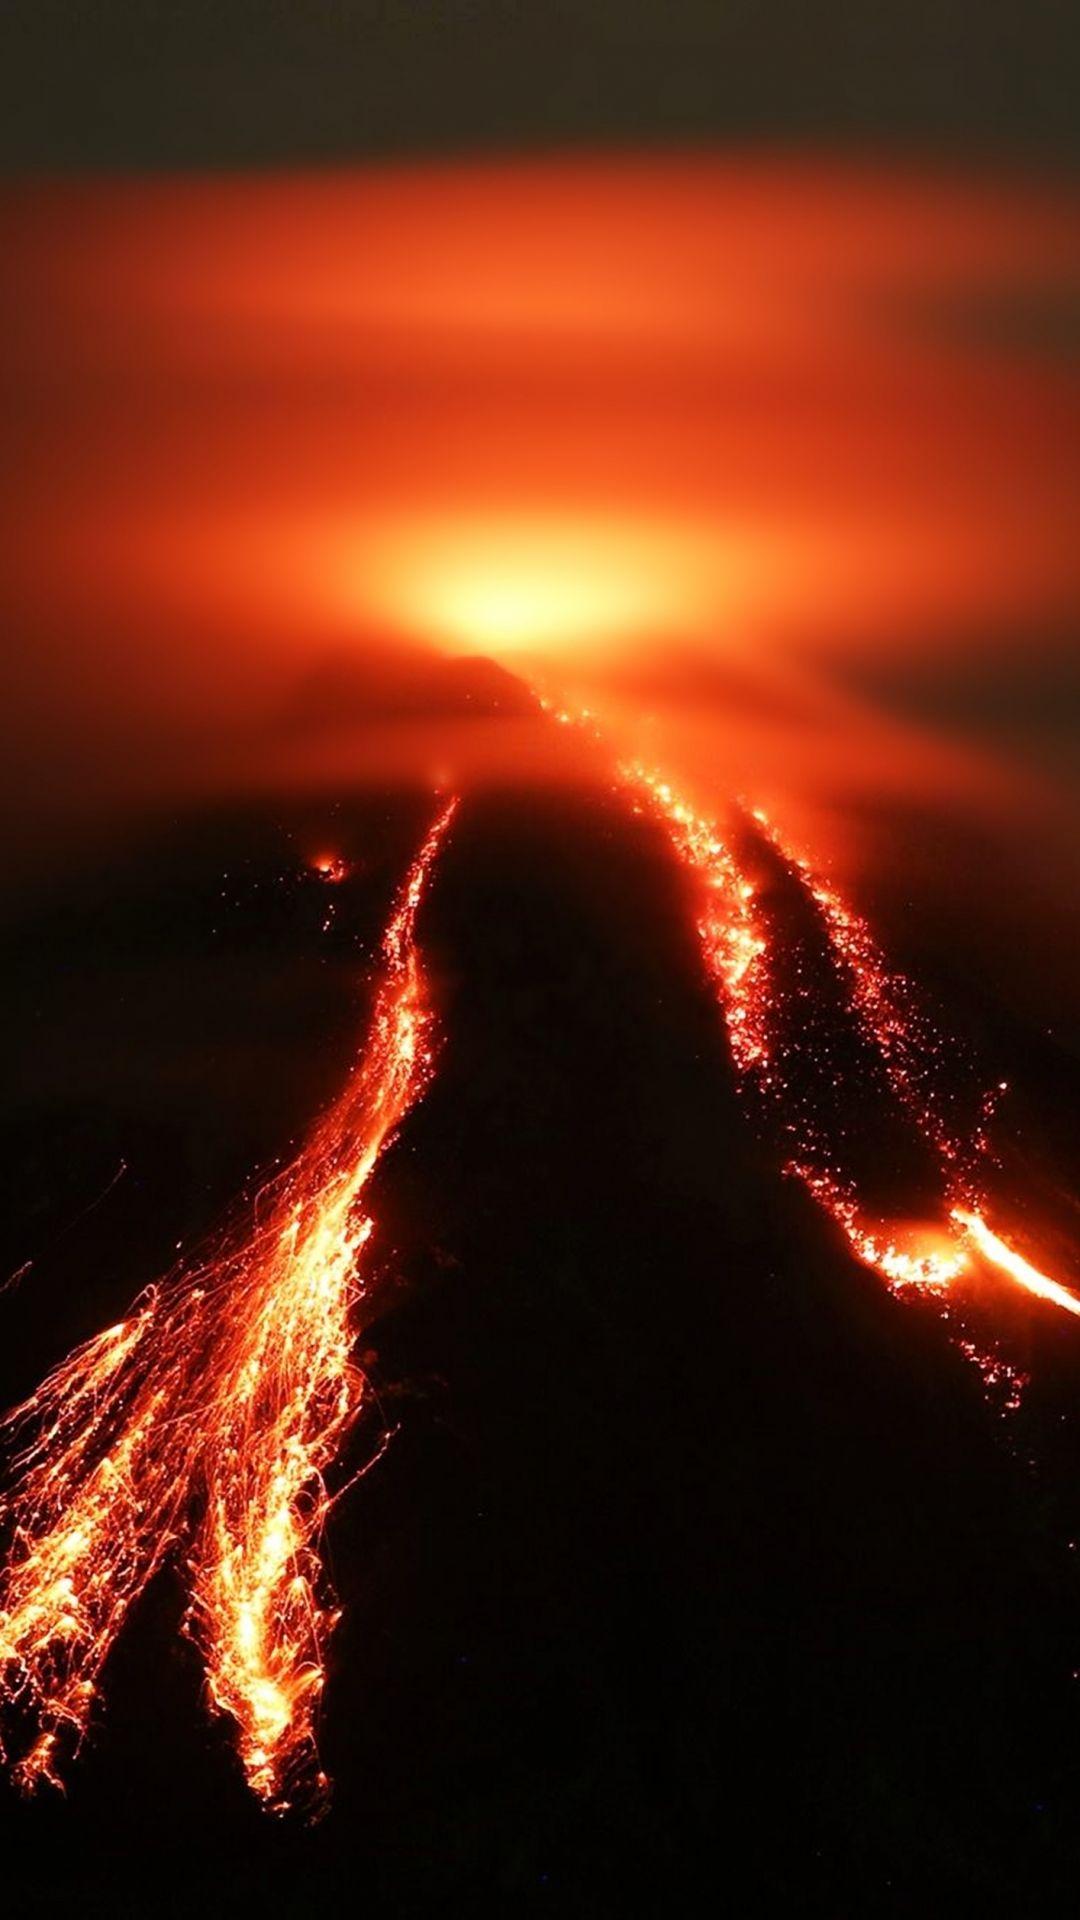 hd volcano wallpaper xp | hd wallpapers | pinterest | volcano